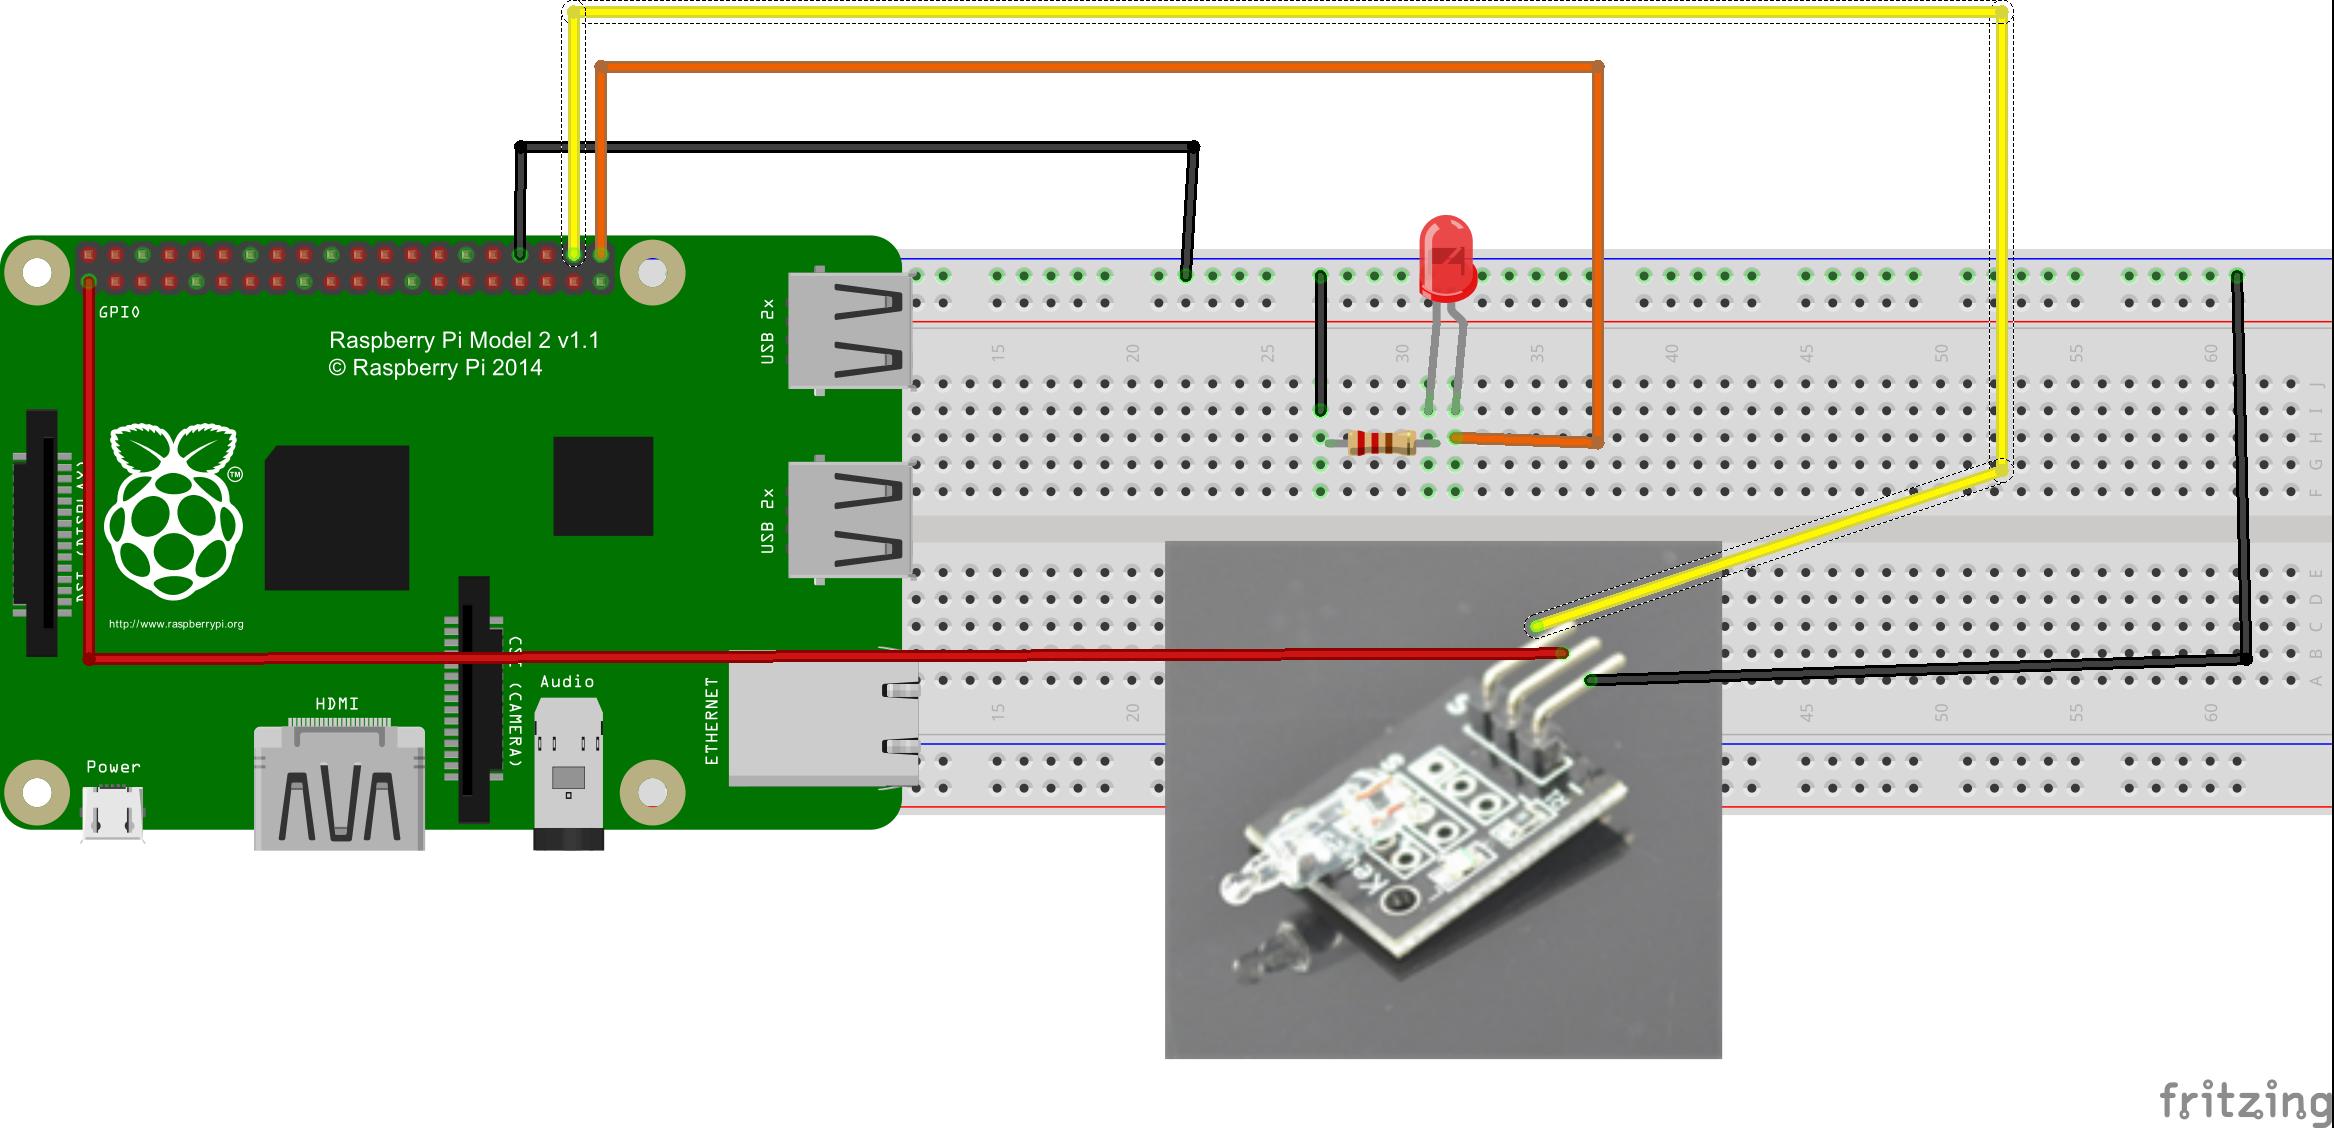 gpio-tilt-sensor